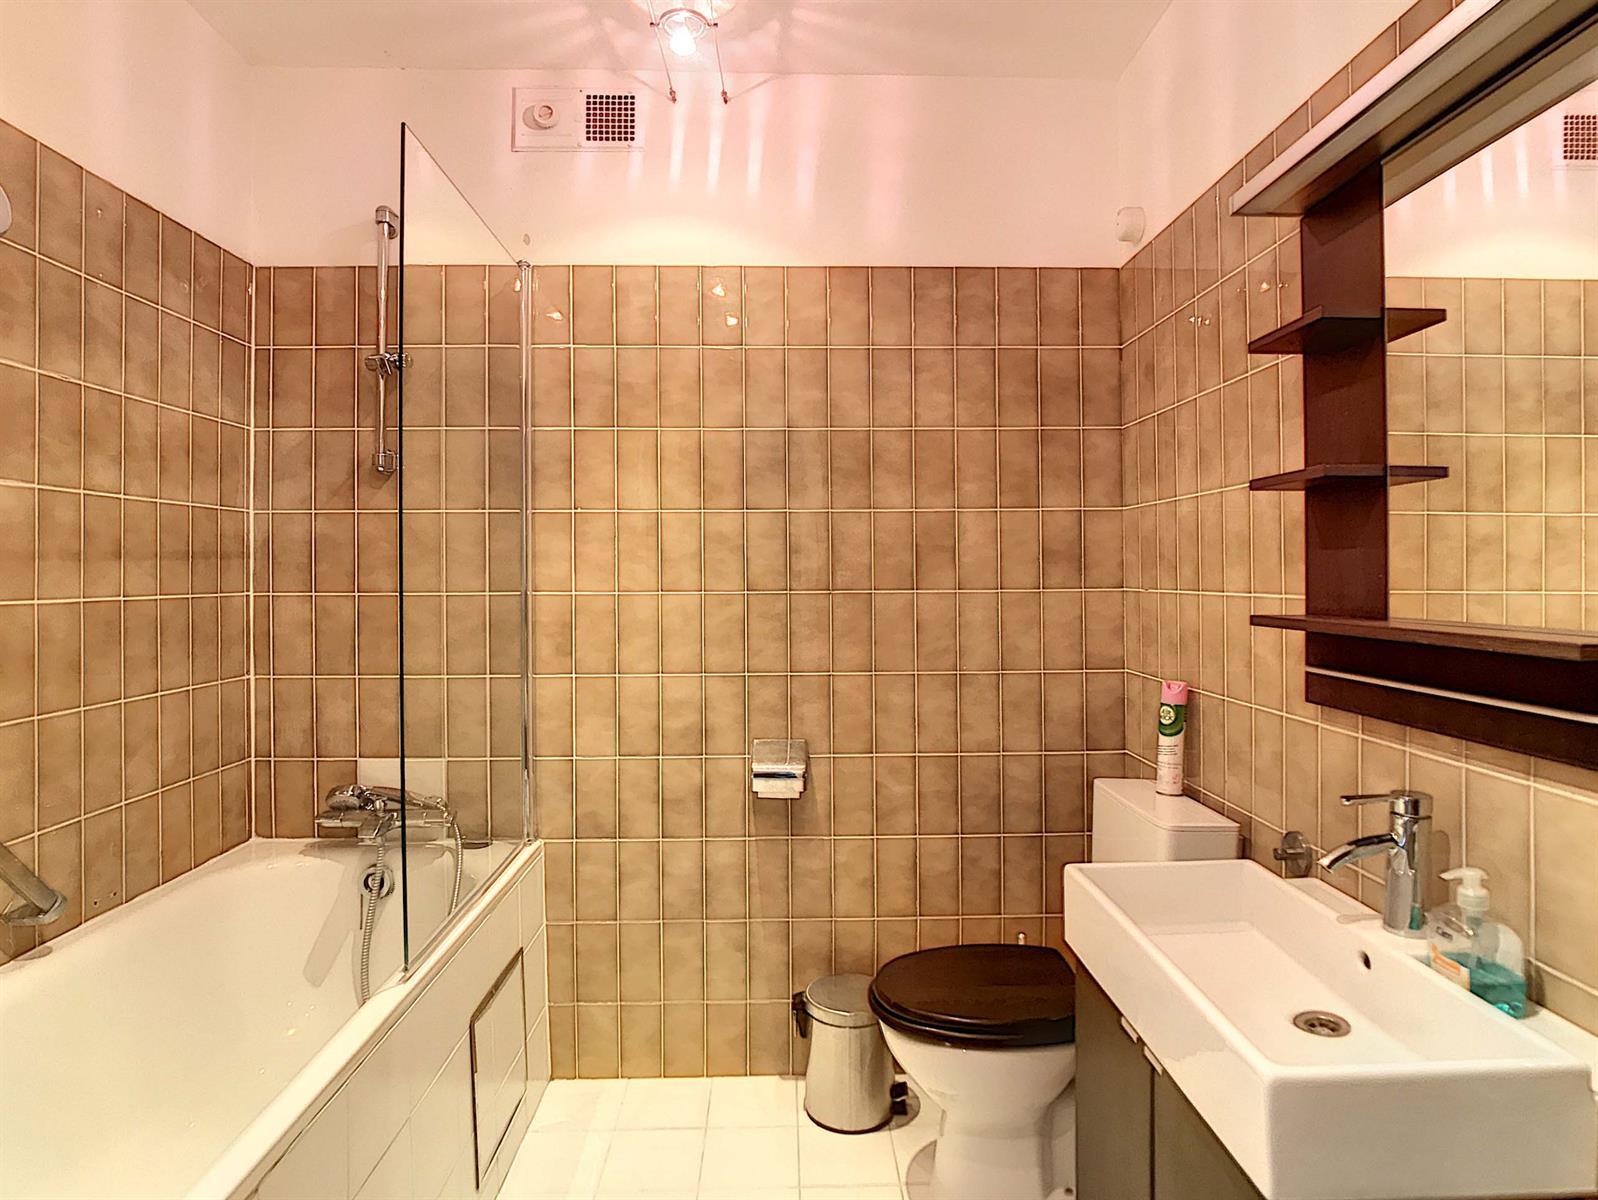 Appartement - Zaventem Sint-Stevens-Woluwe - #4218075-6